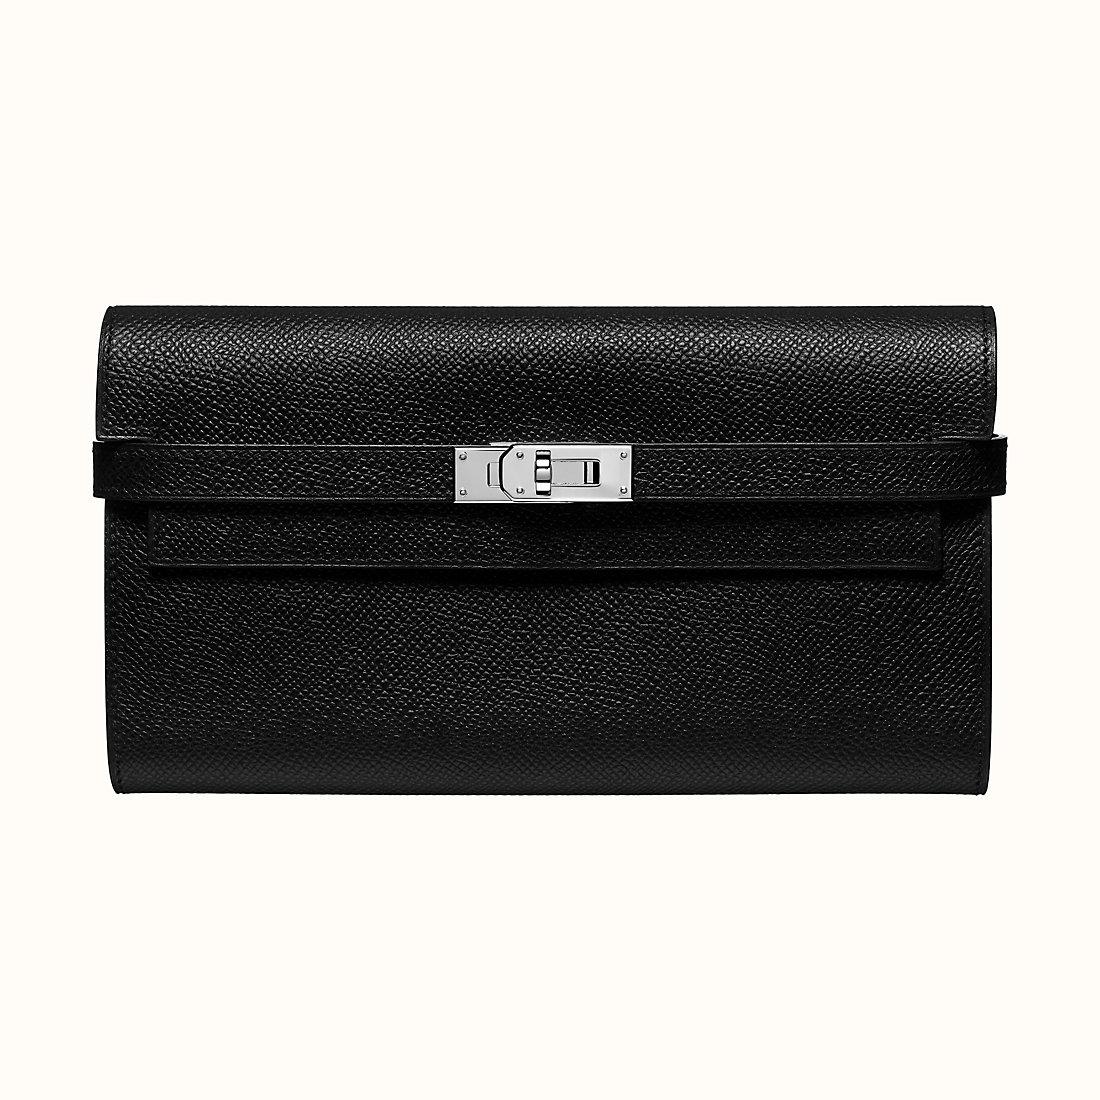 香港西貢區清水湾 Hermes Kelly classic wallet CK89 Noir 黑色 Epsom